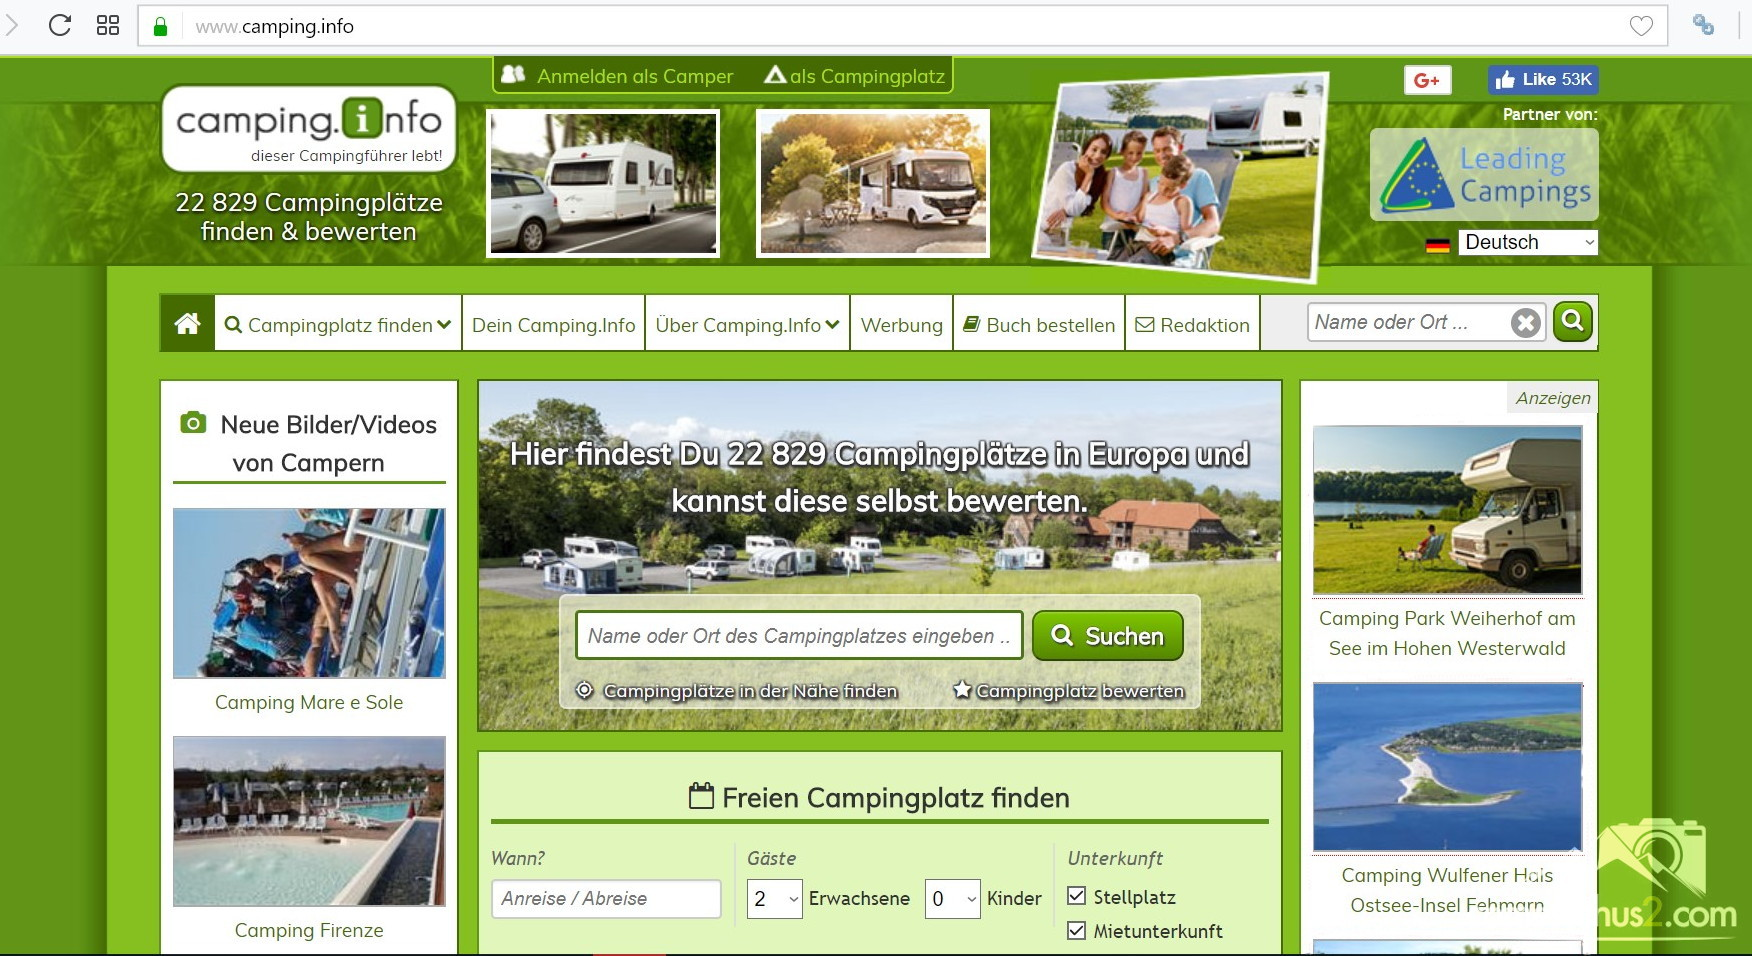 Camping.Info - Campingplatz suchen